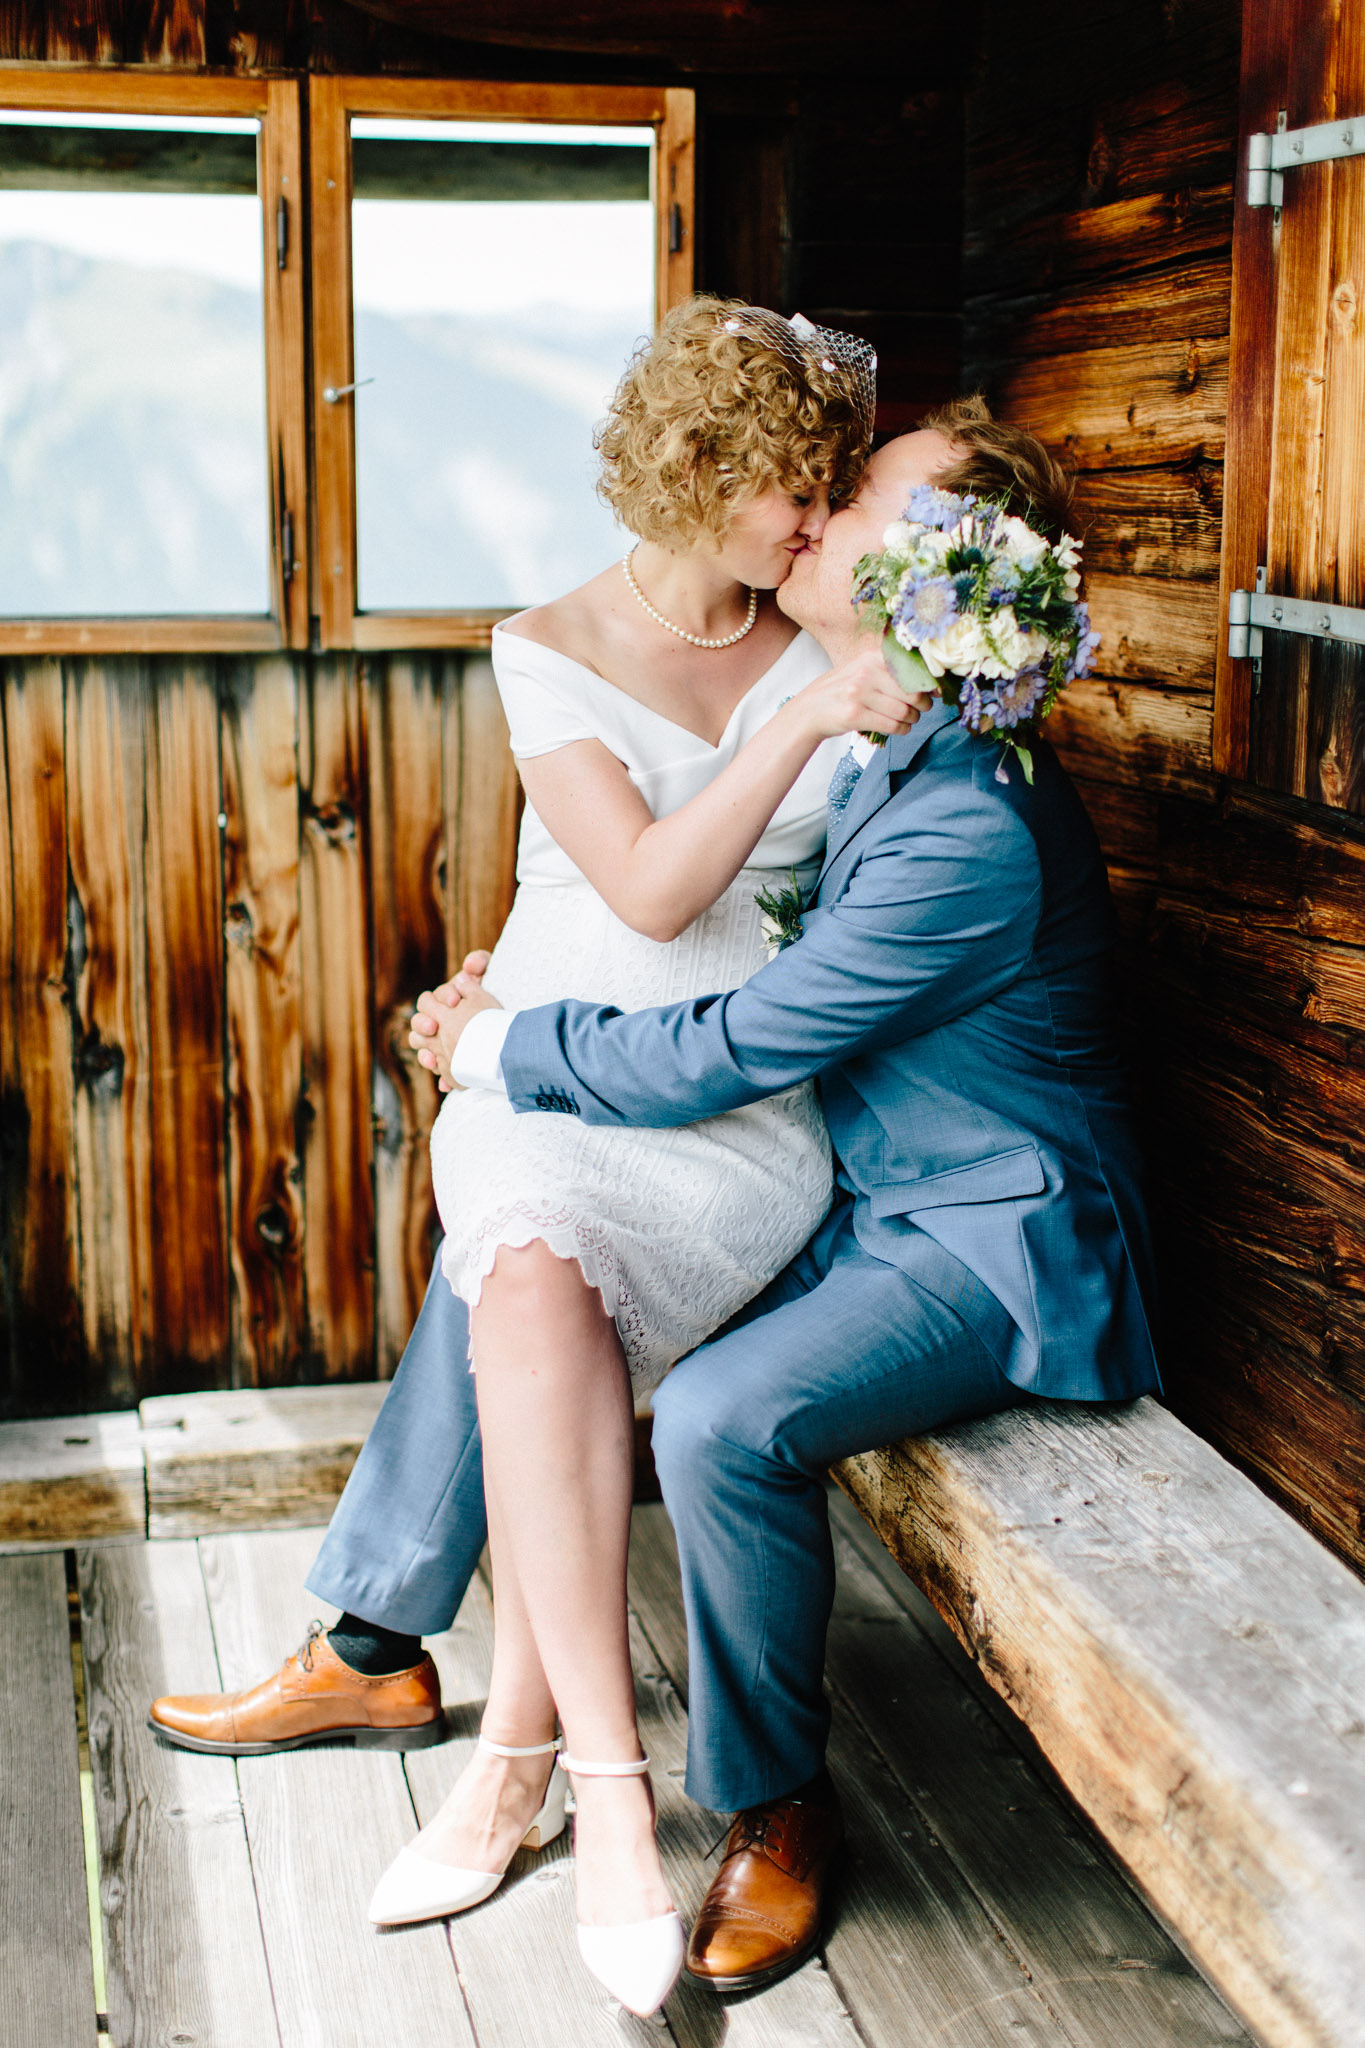 Lenl-Simmental-Buehlerhof-Pia-Anna-Christian-Wedding-Photography-EK-44.jpg